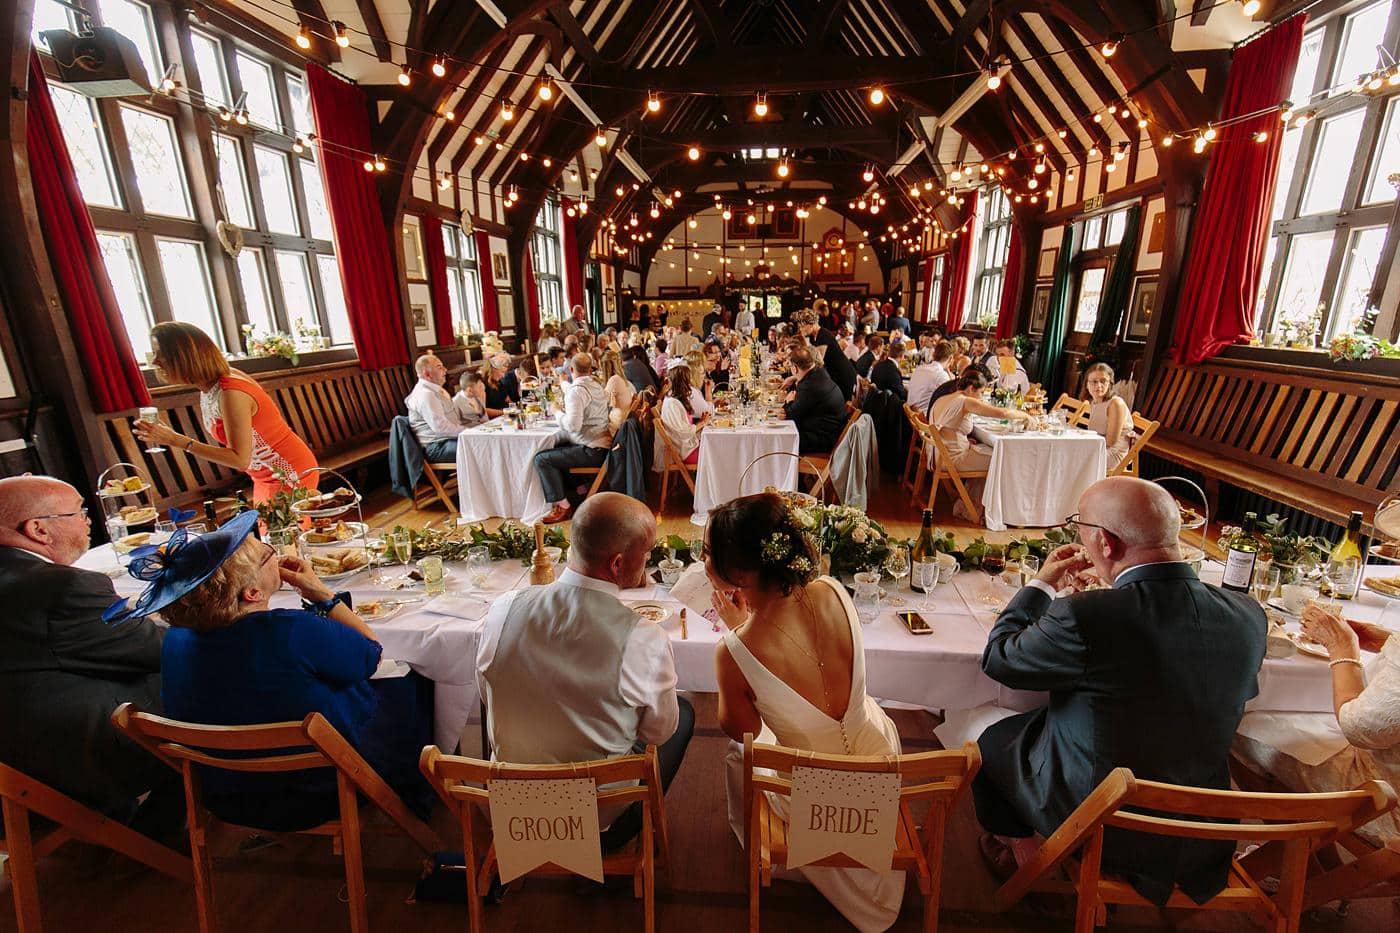 Winstanstow wedding photography 0914